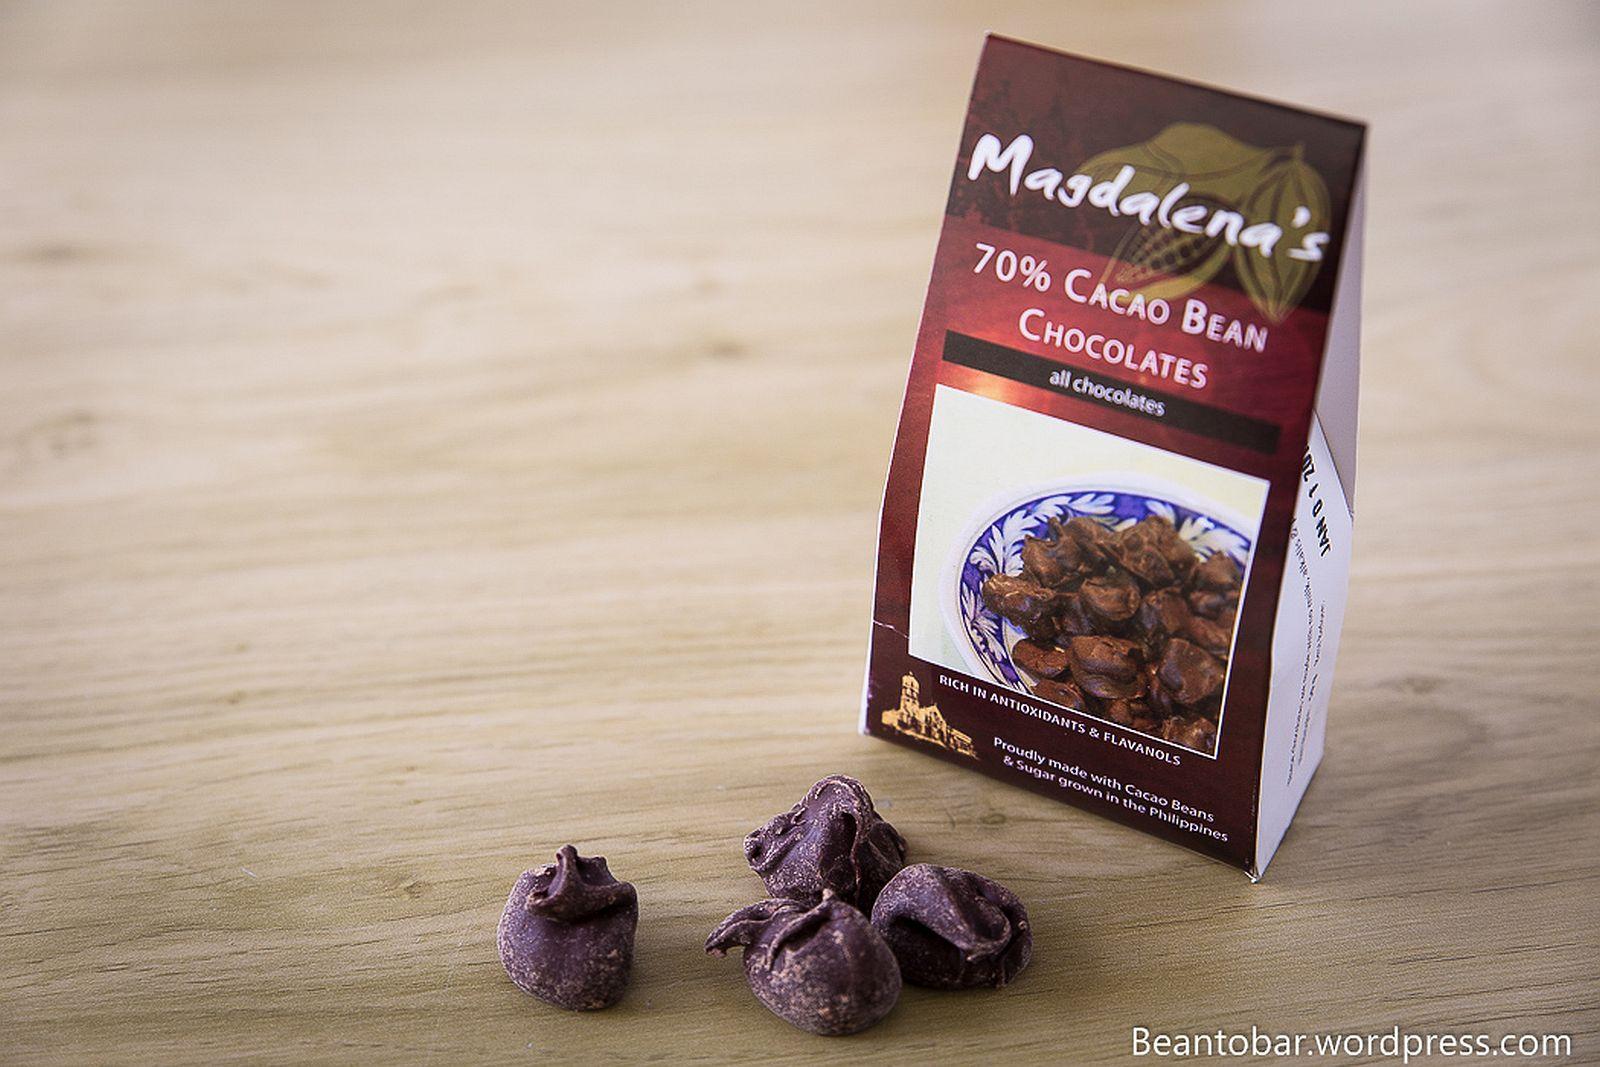 PHILIPPINEN REISEN - Leitfaden zu philippinischer SchokoladePHILIPPINEN REISEN - Leitfaden zu philippinischer Schokolade